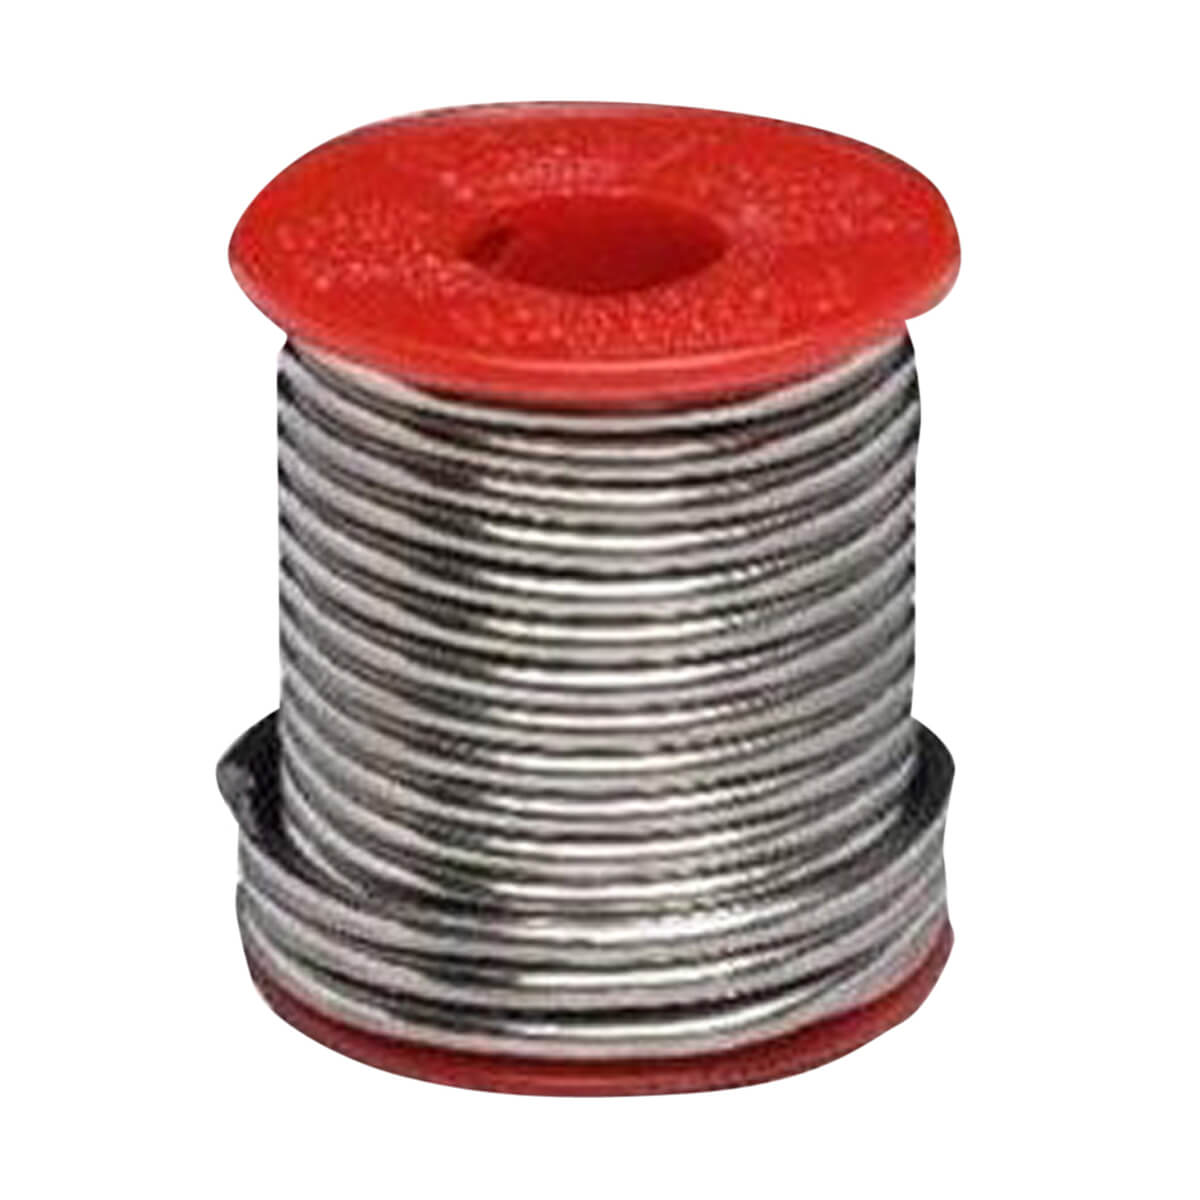 Oatey 20015 - 1 lb -16 oz - 50/50 GP Solid Wire Solder